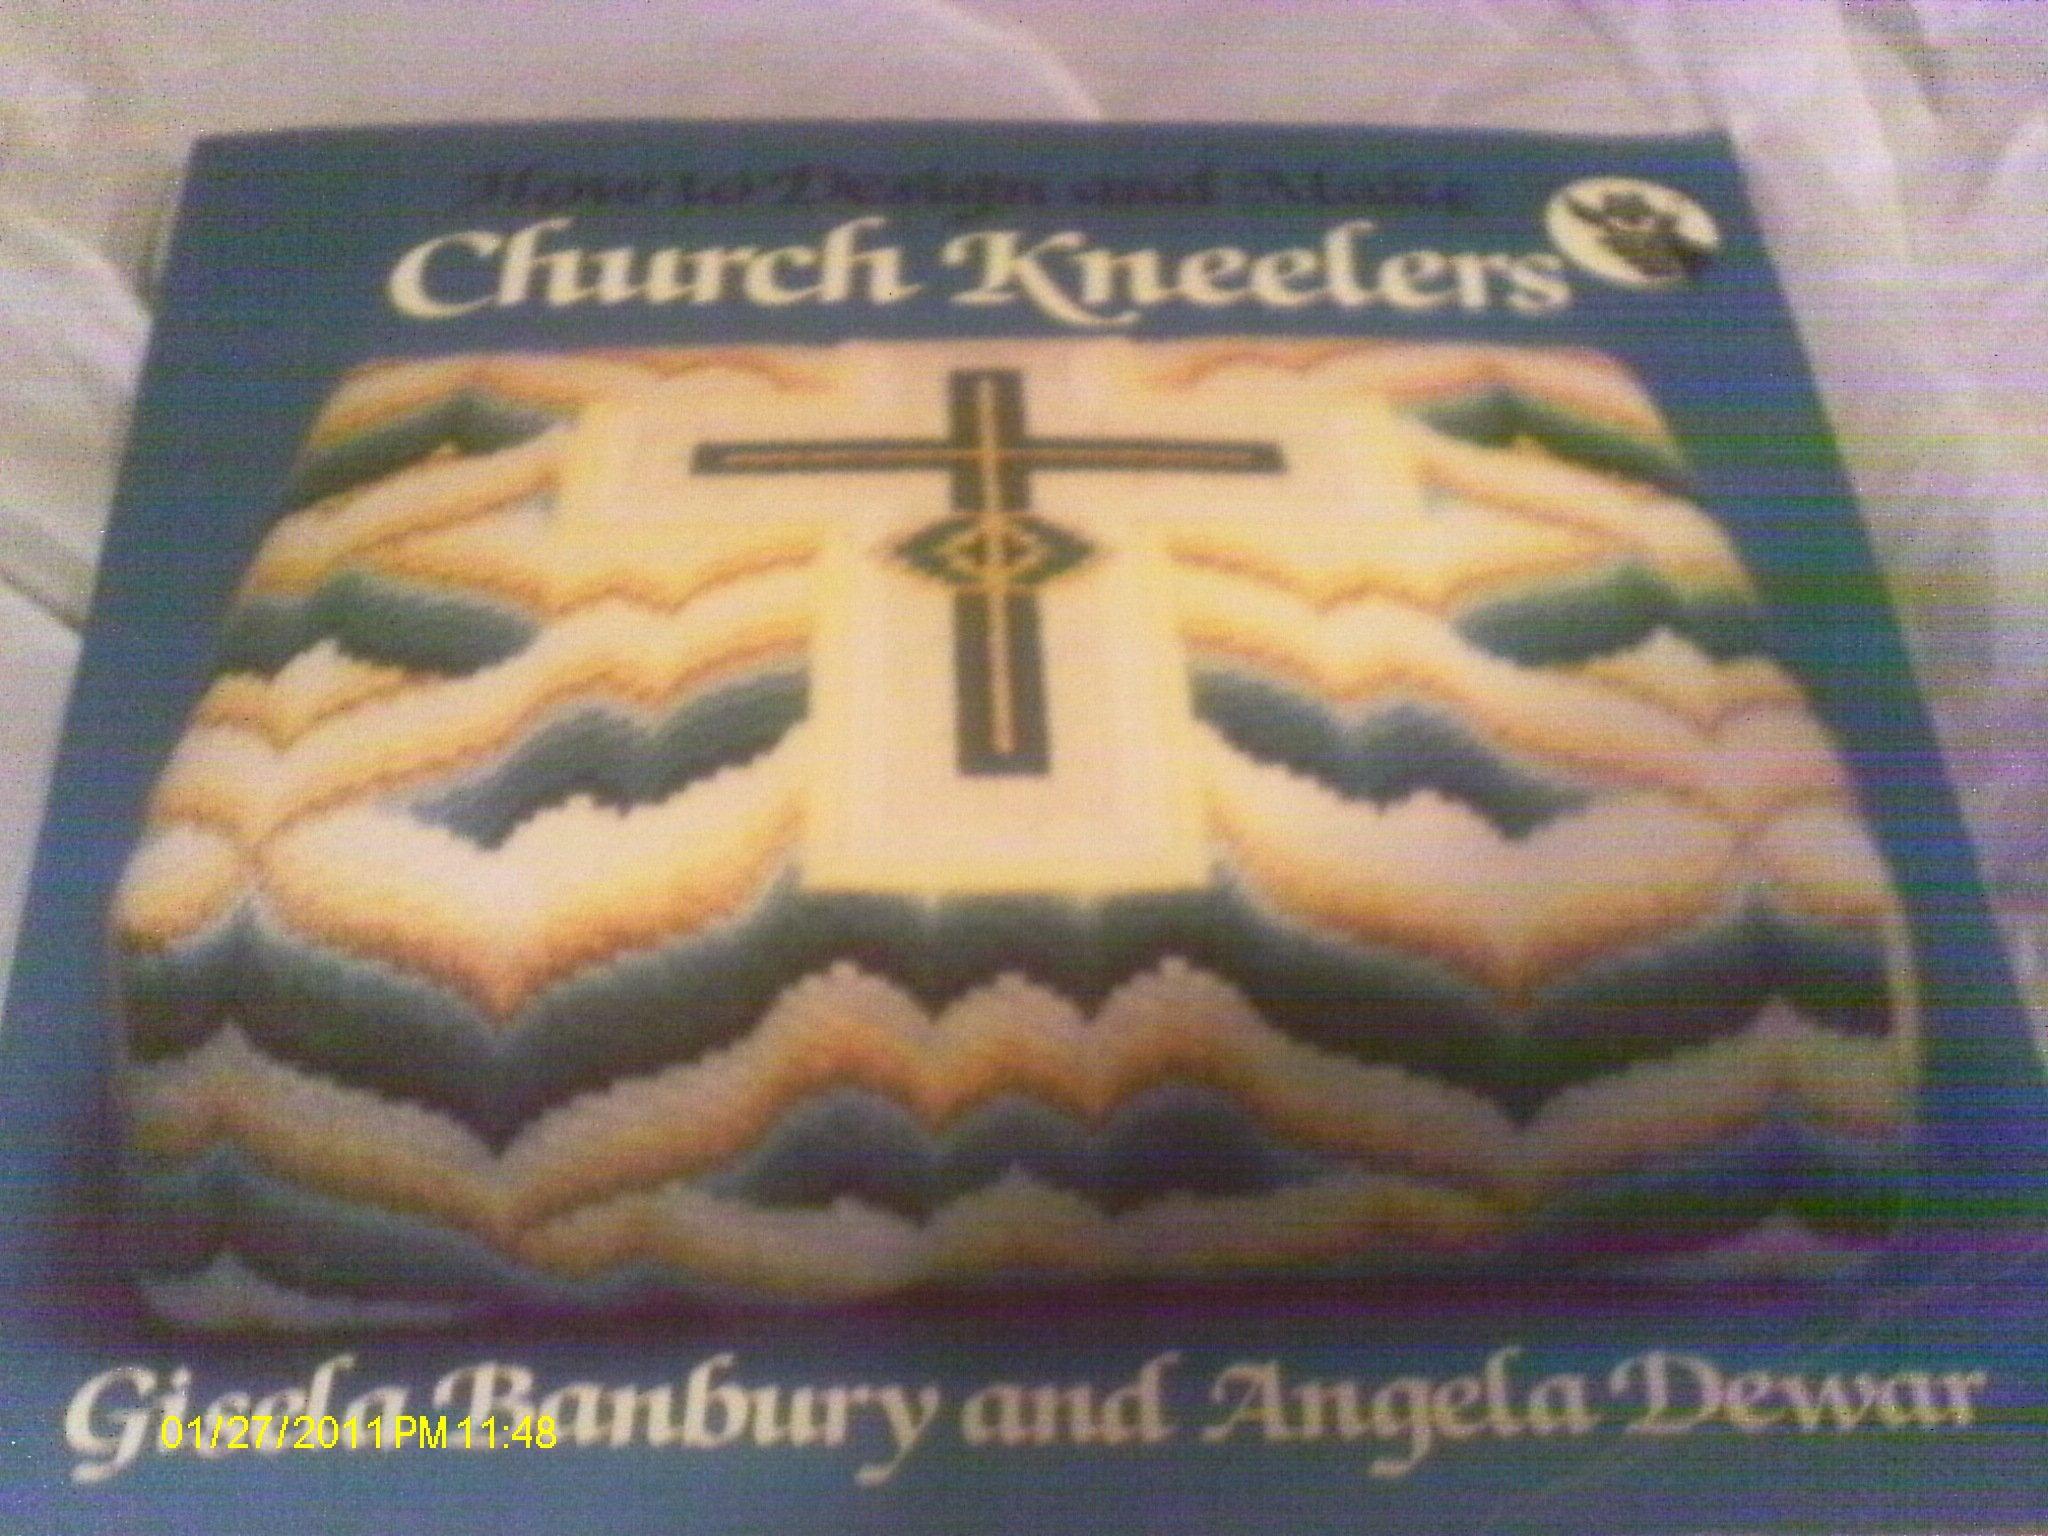 How to Design and Make Church Kneelers: Amazon.de: Angela Dewar, Gisela  Banbury: Fremdsprachige Bücher